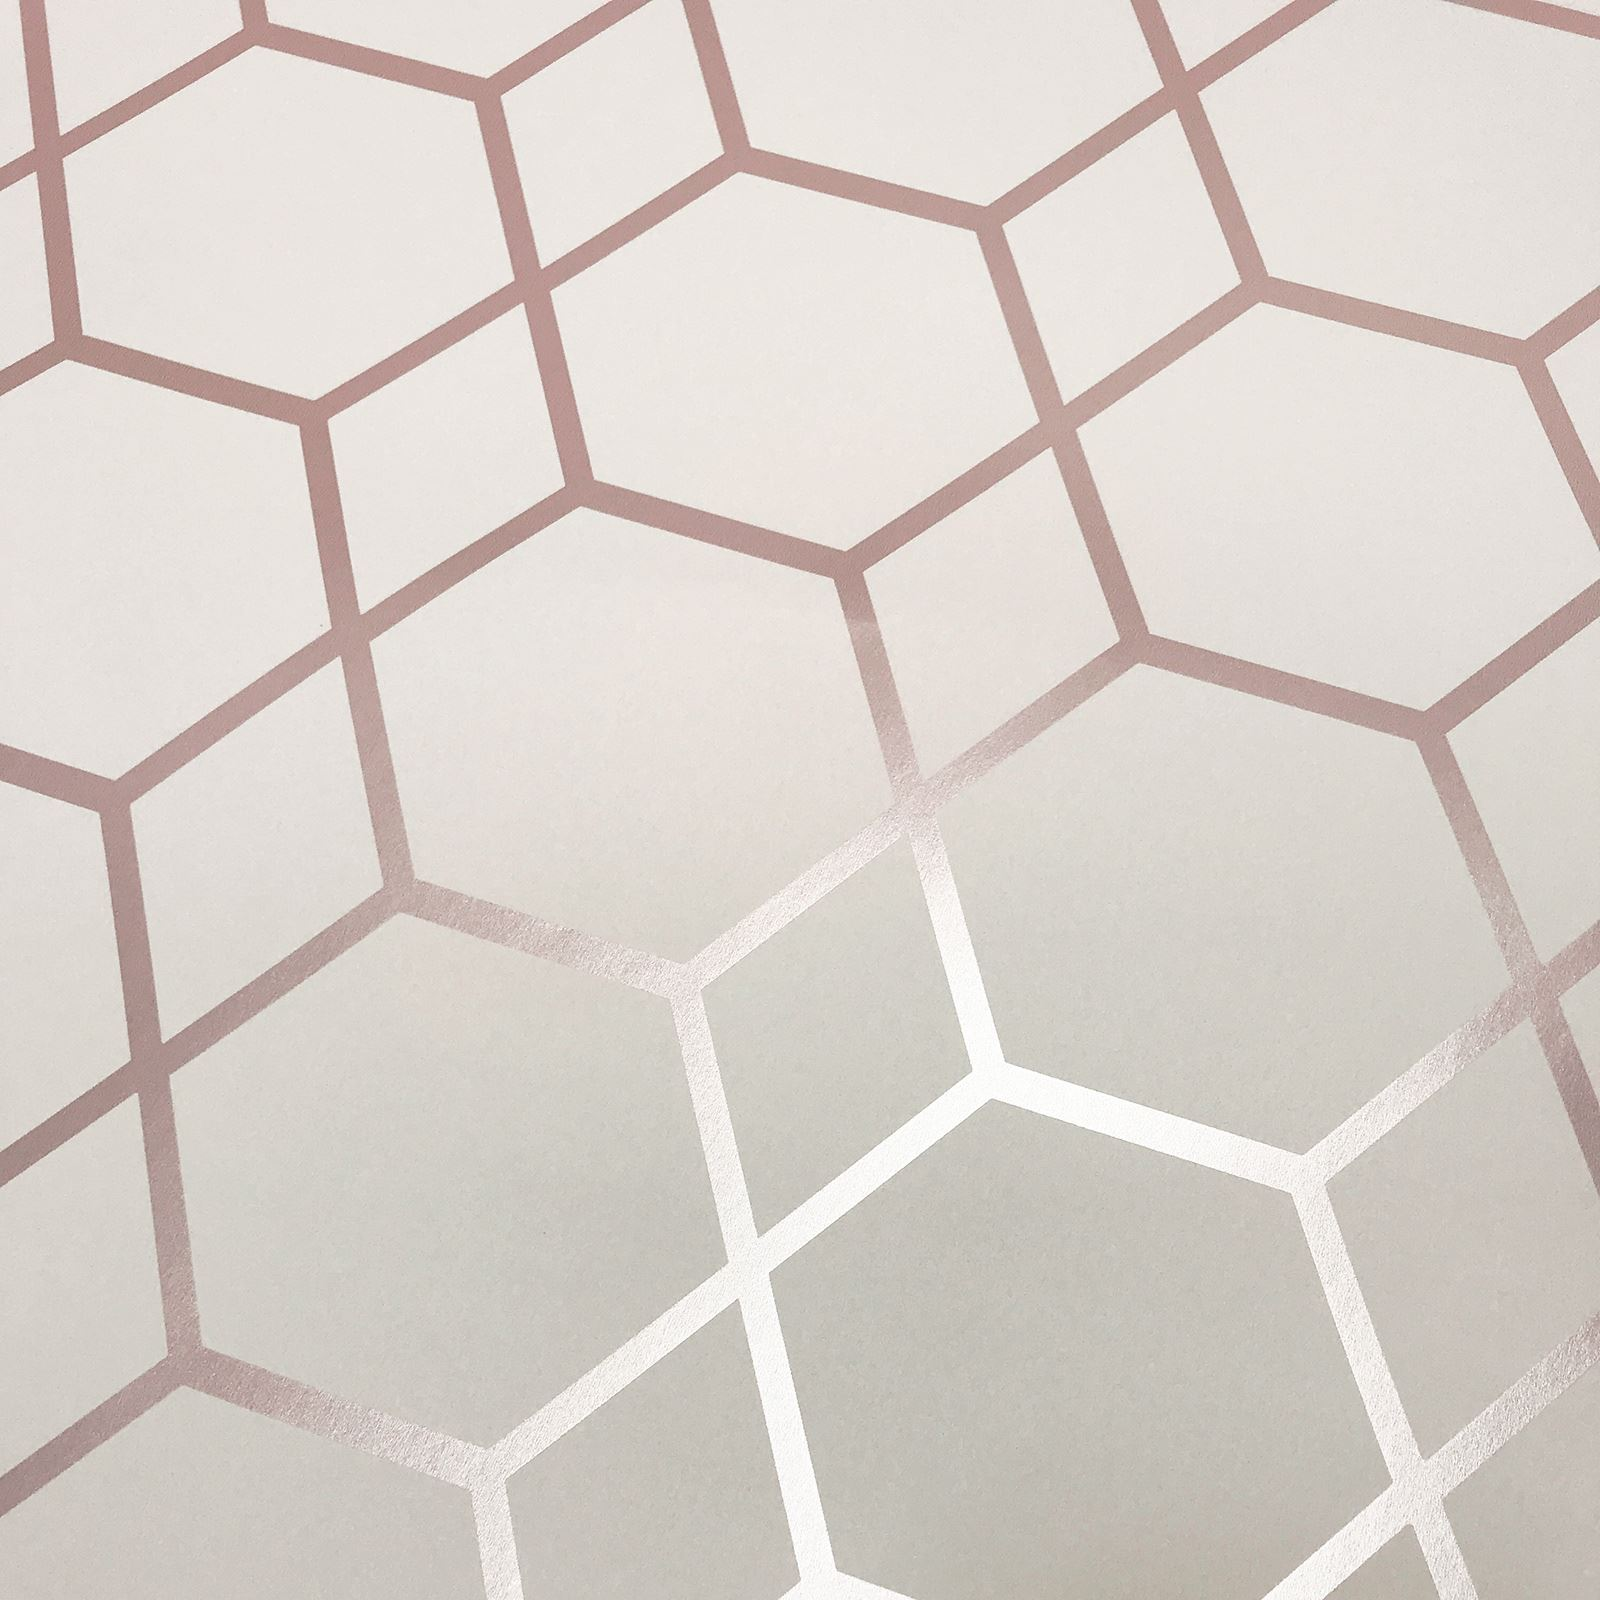 Muriva Casca Geometric Metallic Wallpaper Diamonds Hexagons Silver